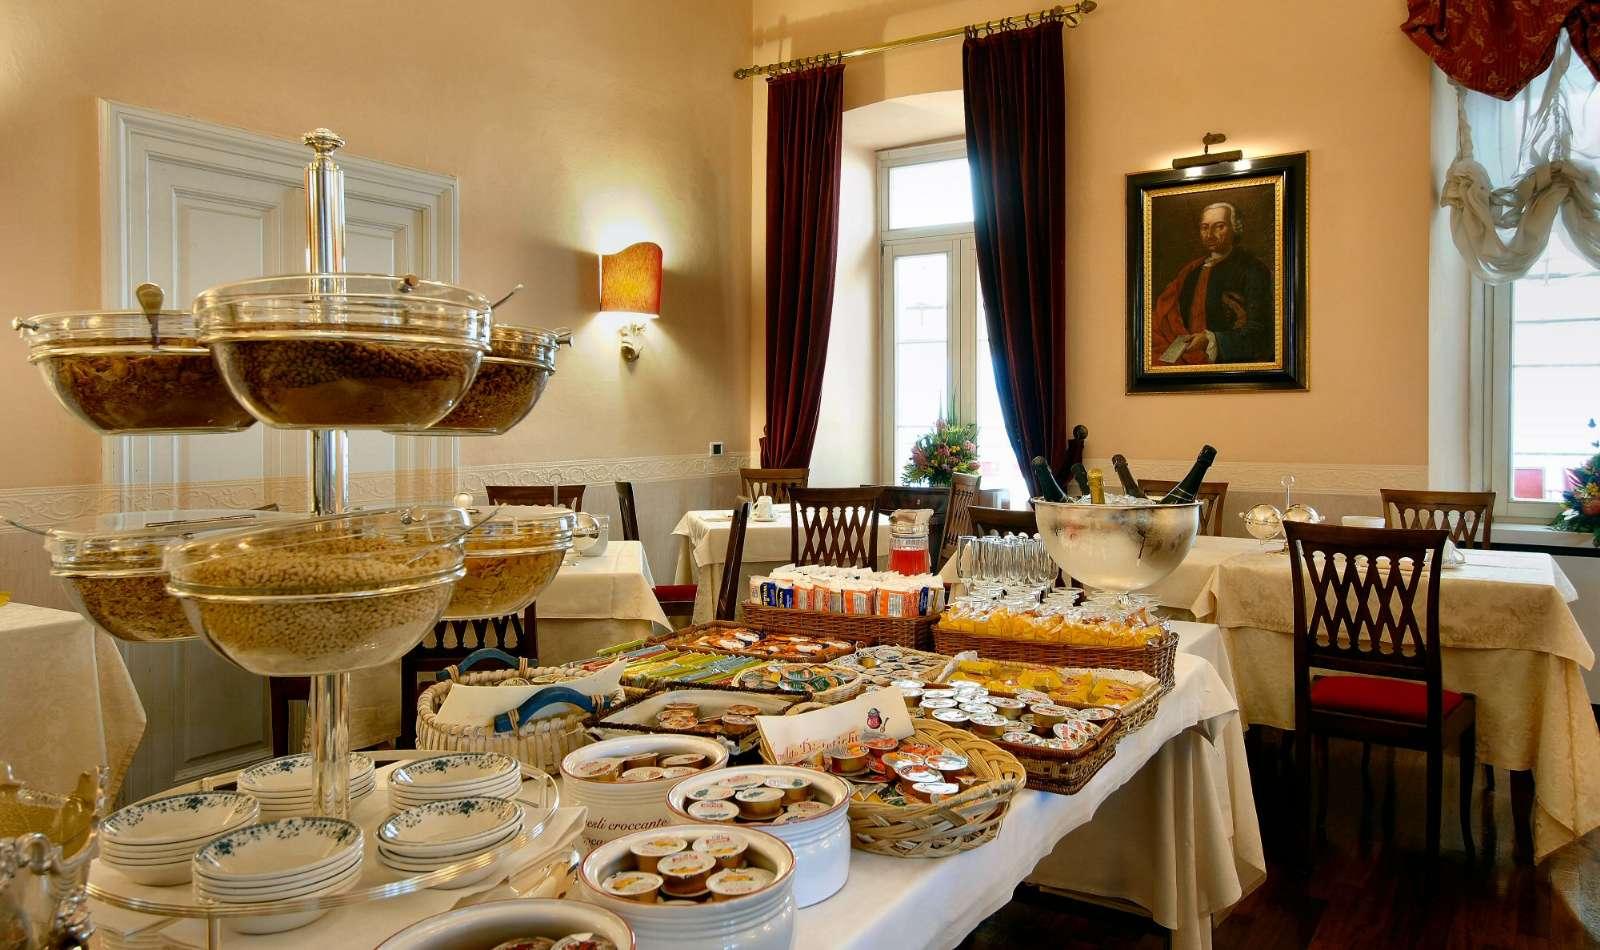 Den rige morgenmadsbuffet